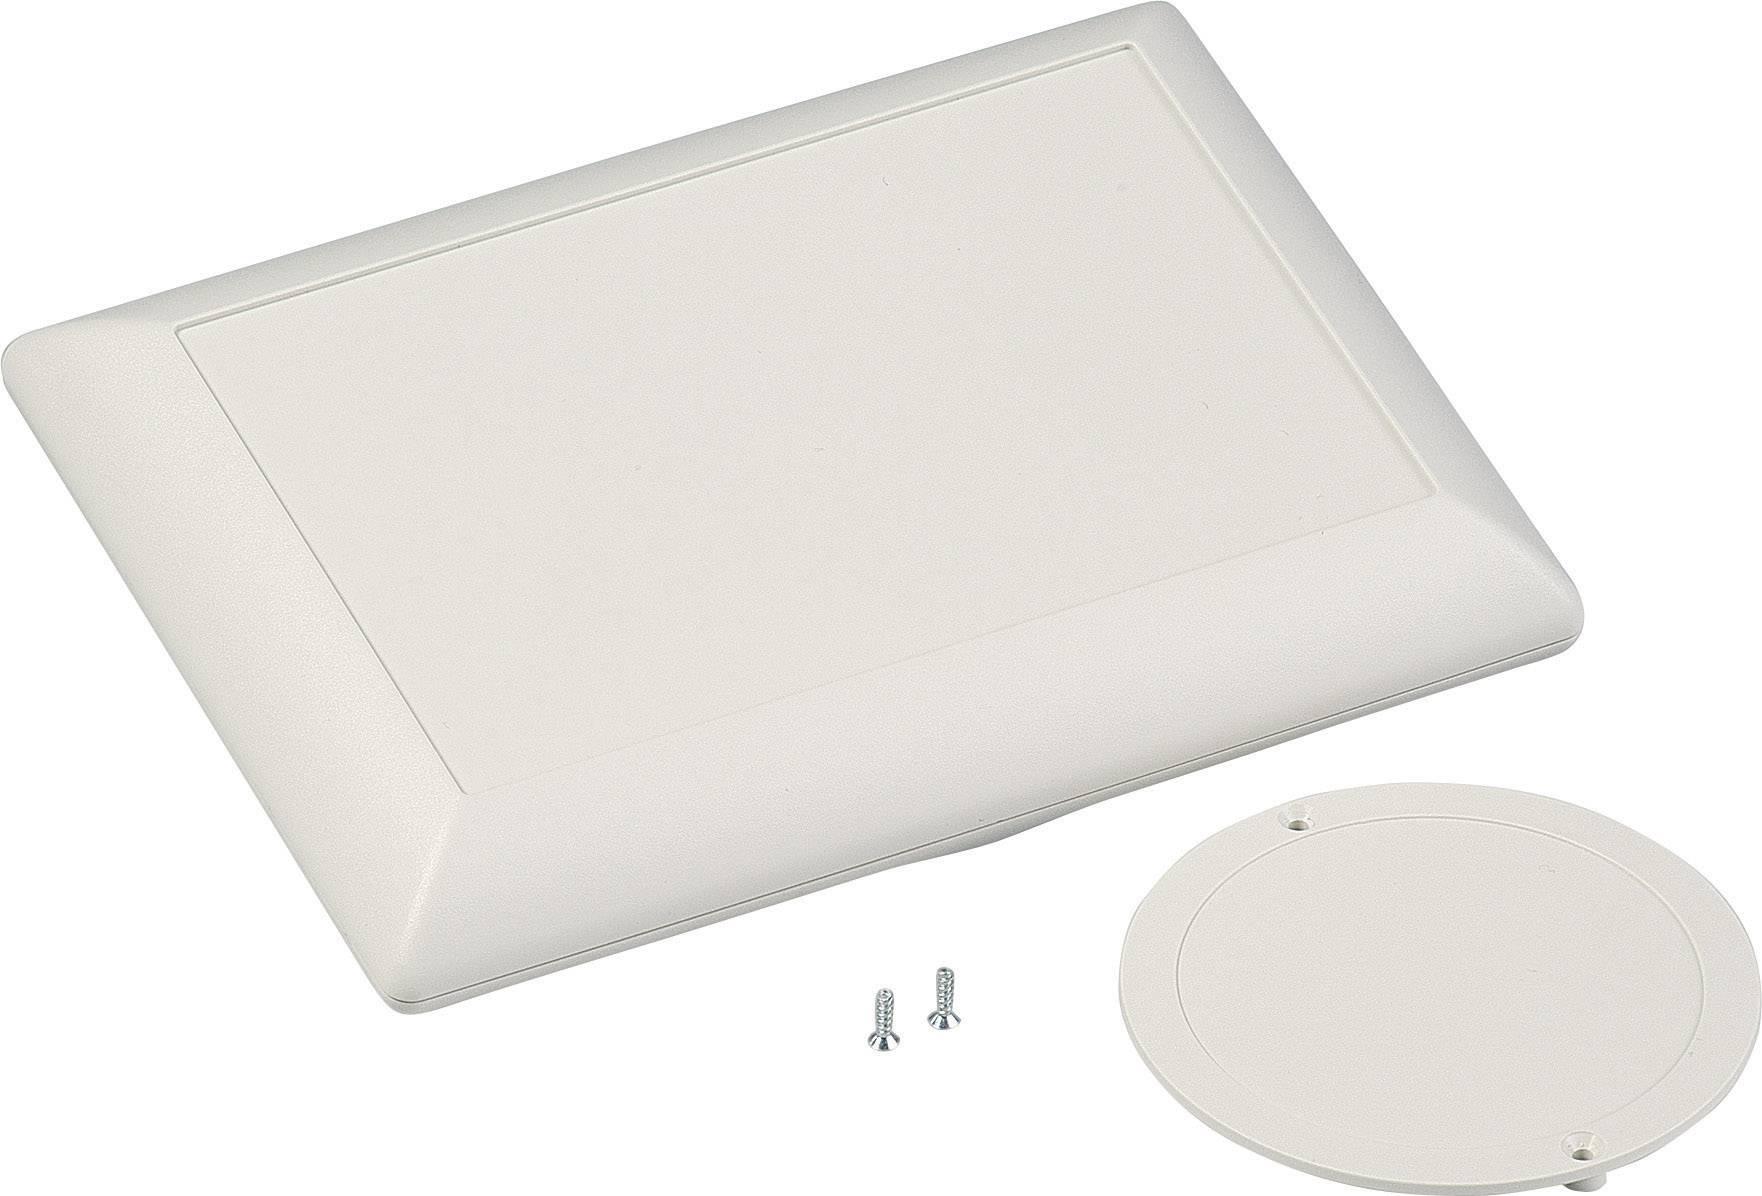 Skrinka na ovládací pult OKW Art-Case D5017247, 160 x 110 x 40 mm, ABS, sivobiela (RAL 9002), 1 sada